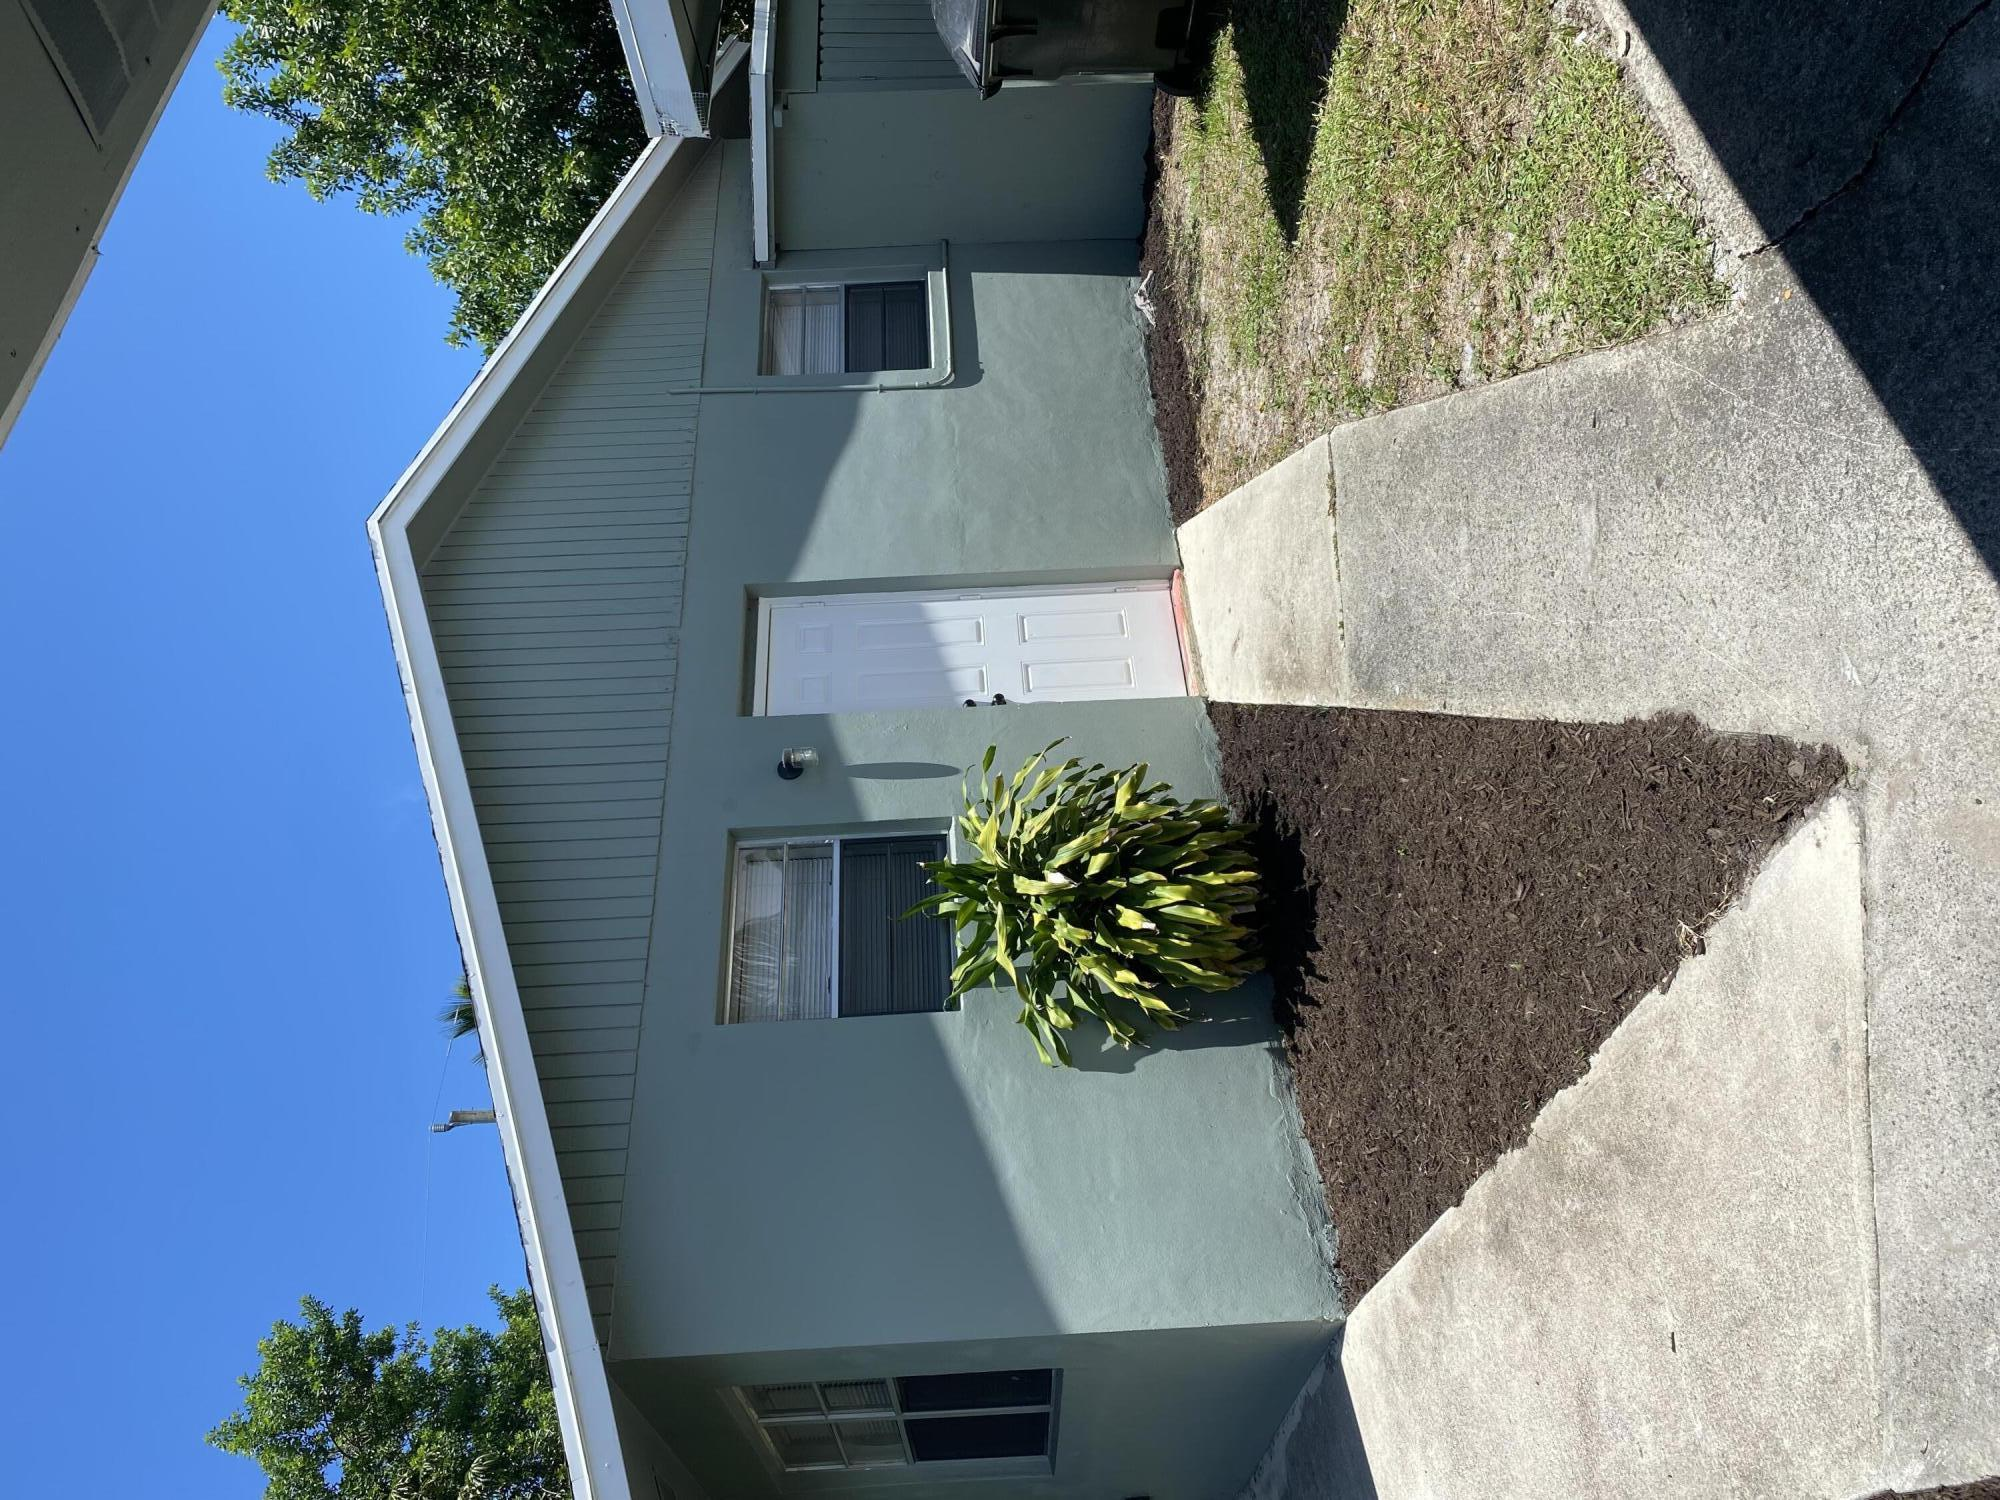 235 NW 10th Avenue #237 - 33444 - FL - Delray Beach